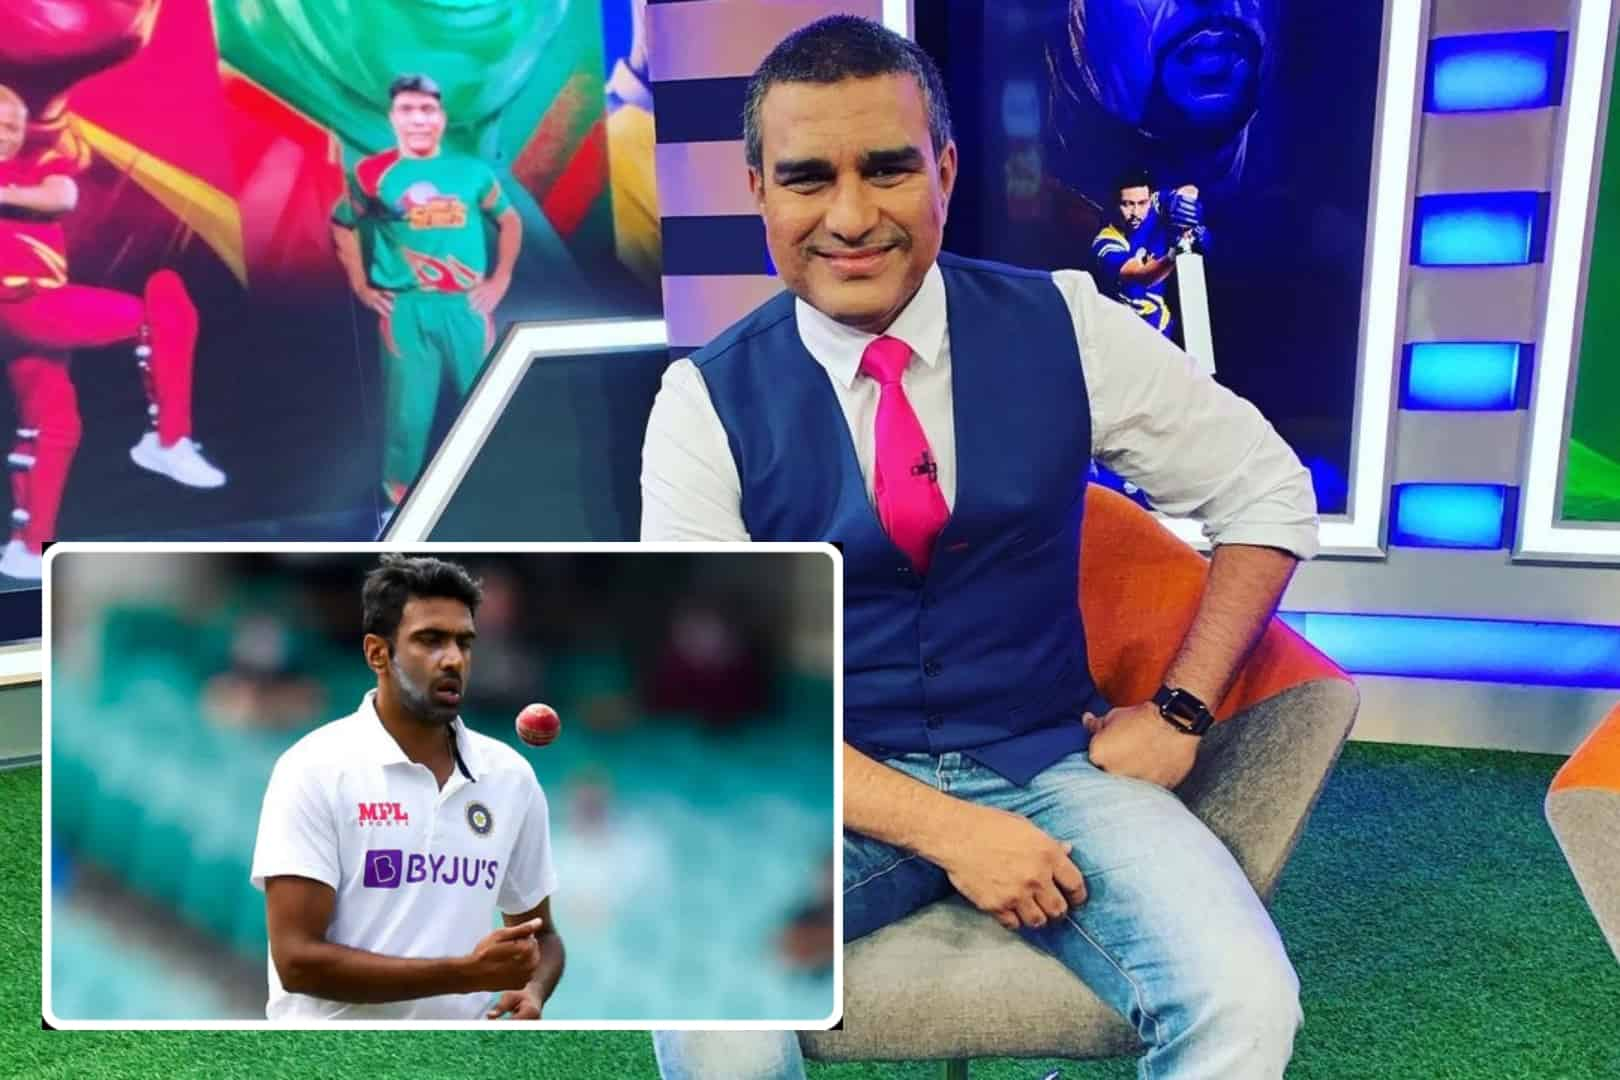 Sanjay Manjrekar Feels That R Ashwin Is Not An All-Time Great, Says Jadeja Has Matched Him